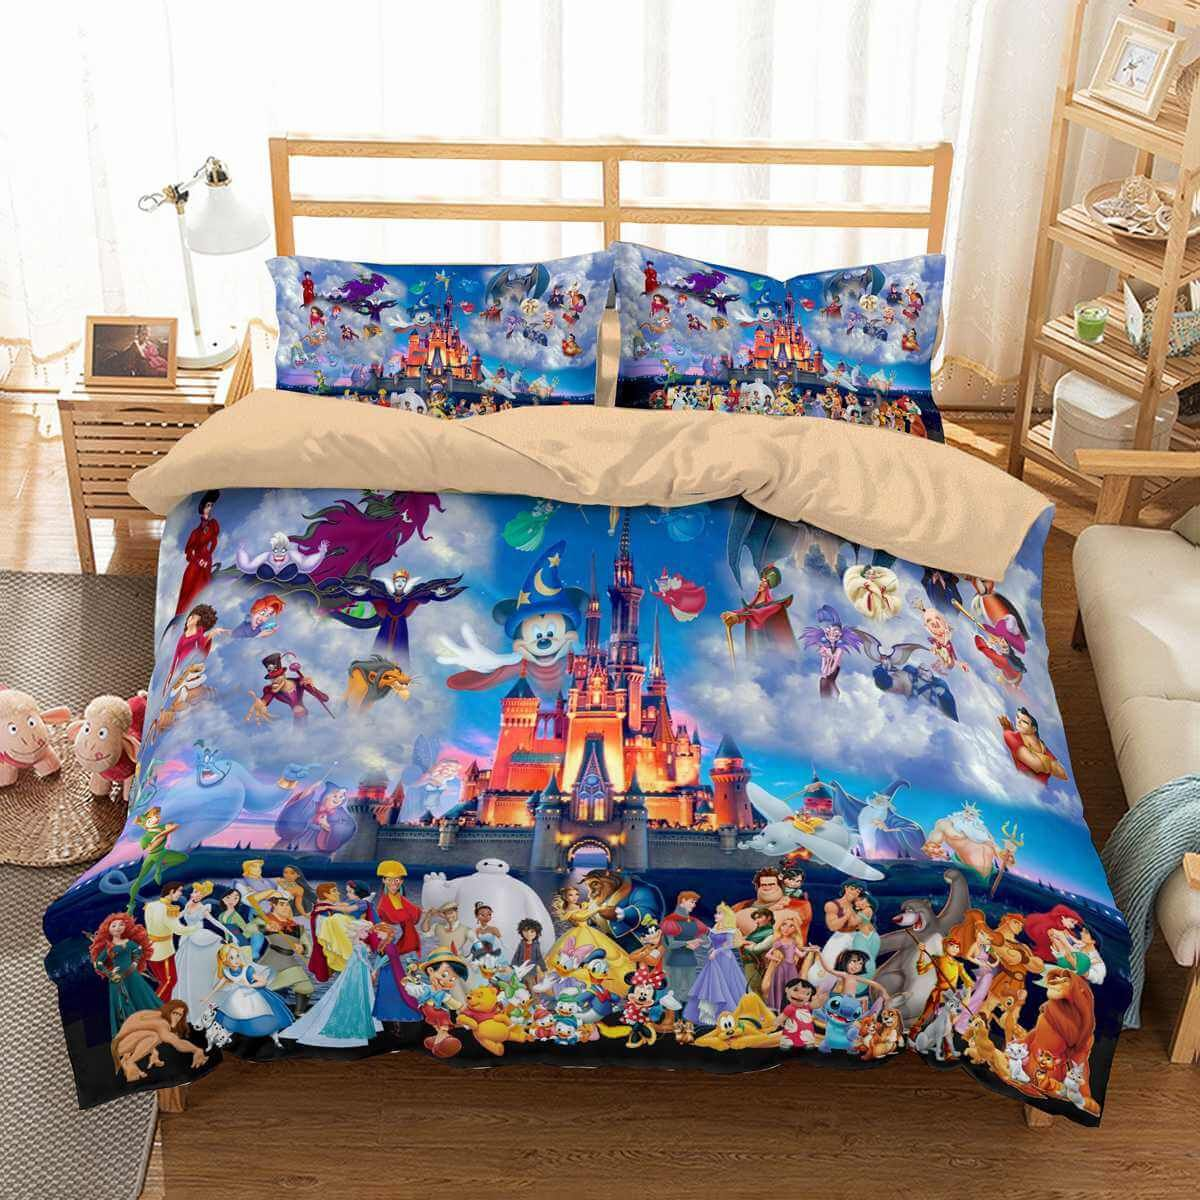 3d Customize Disney Bedding Set Duvet Cover Set Bedroom Set